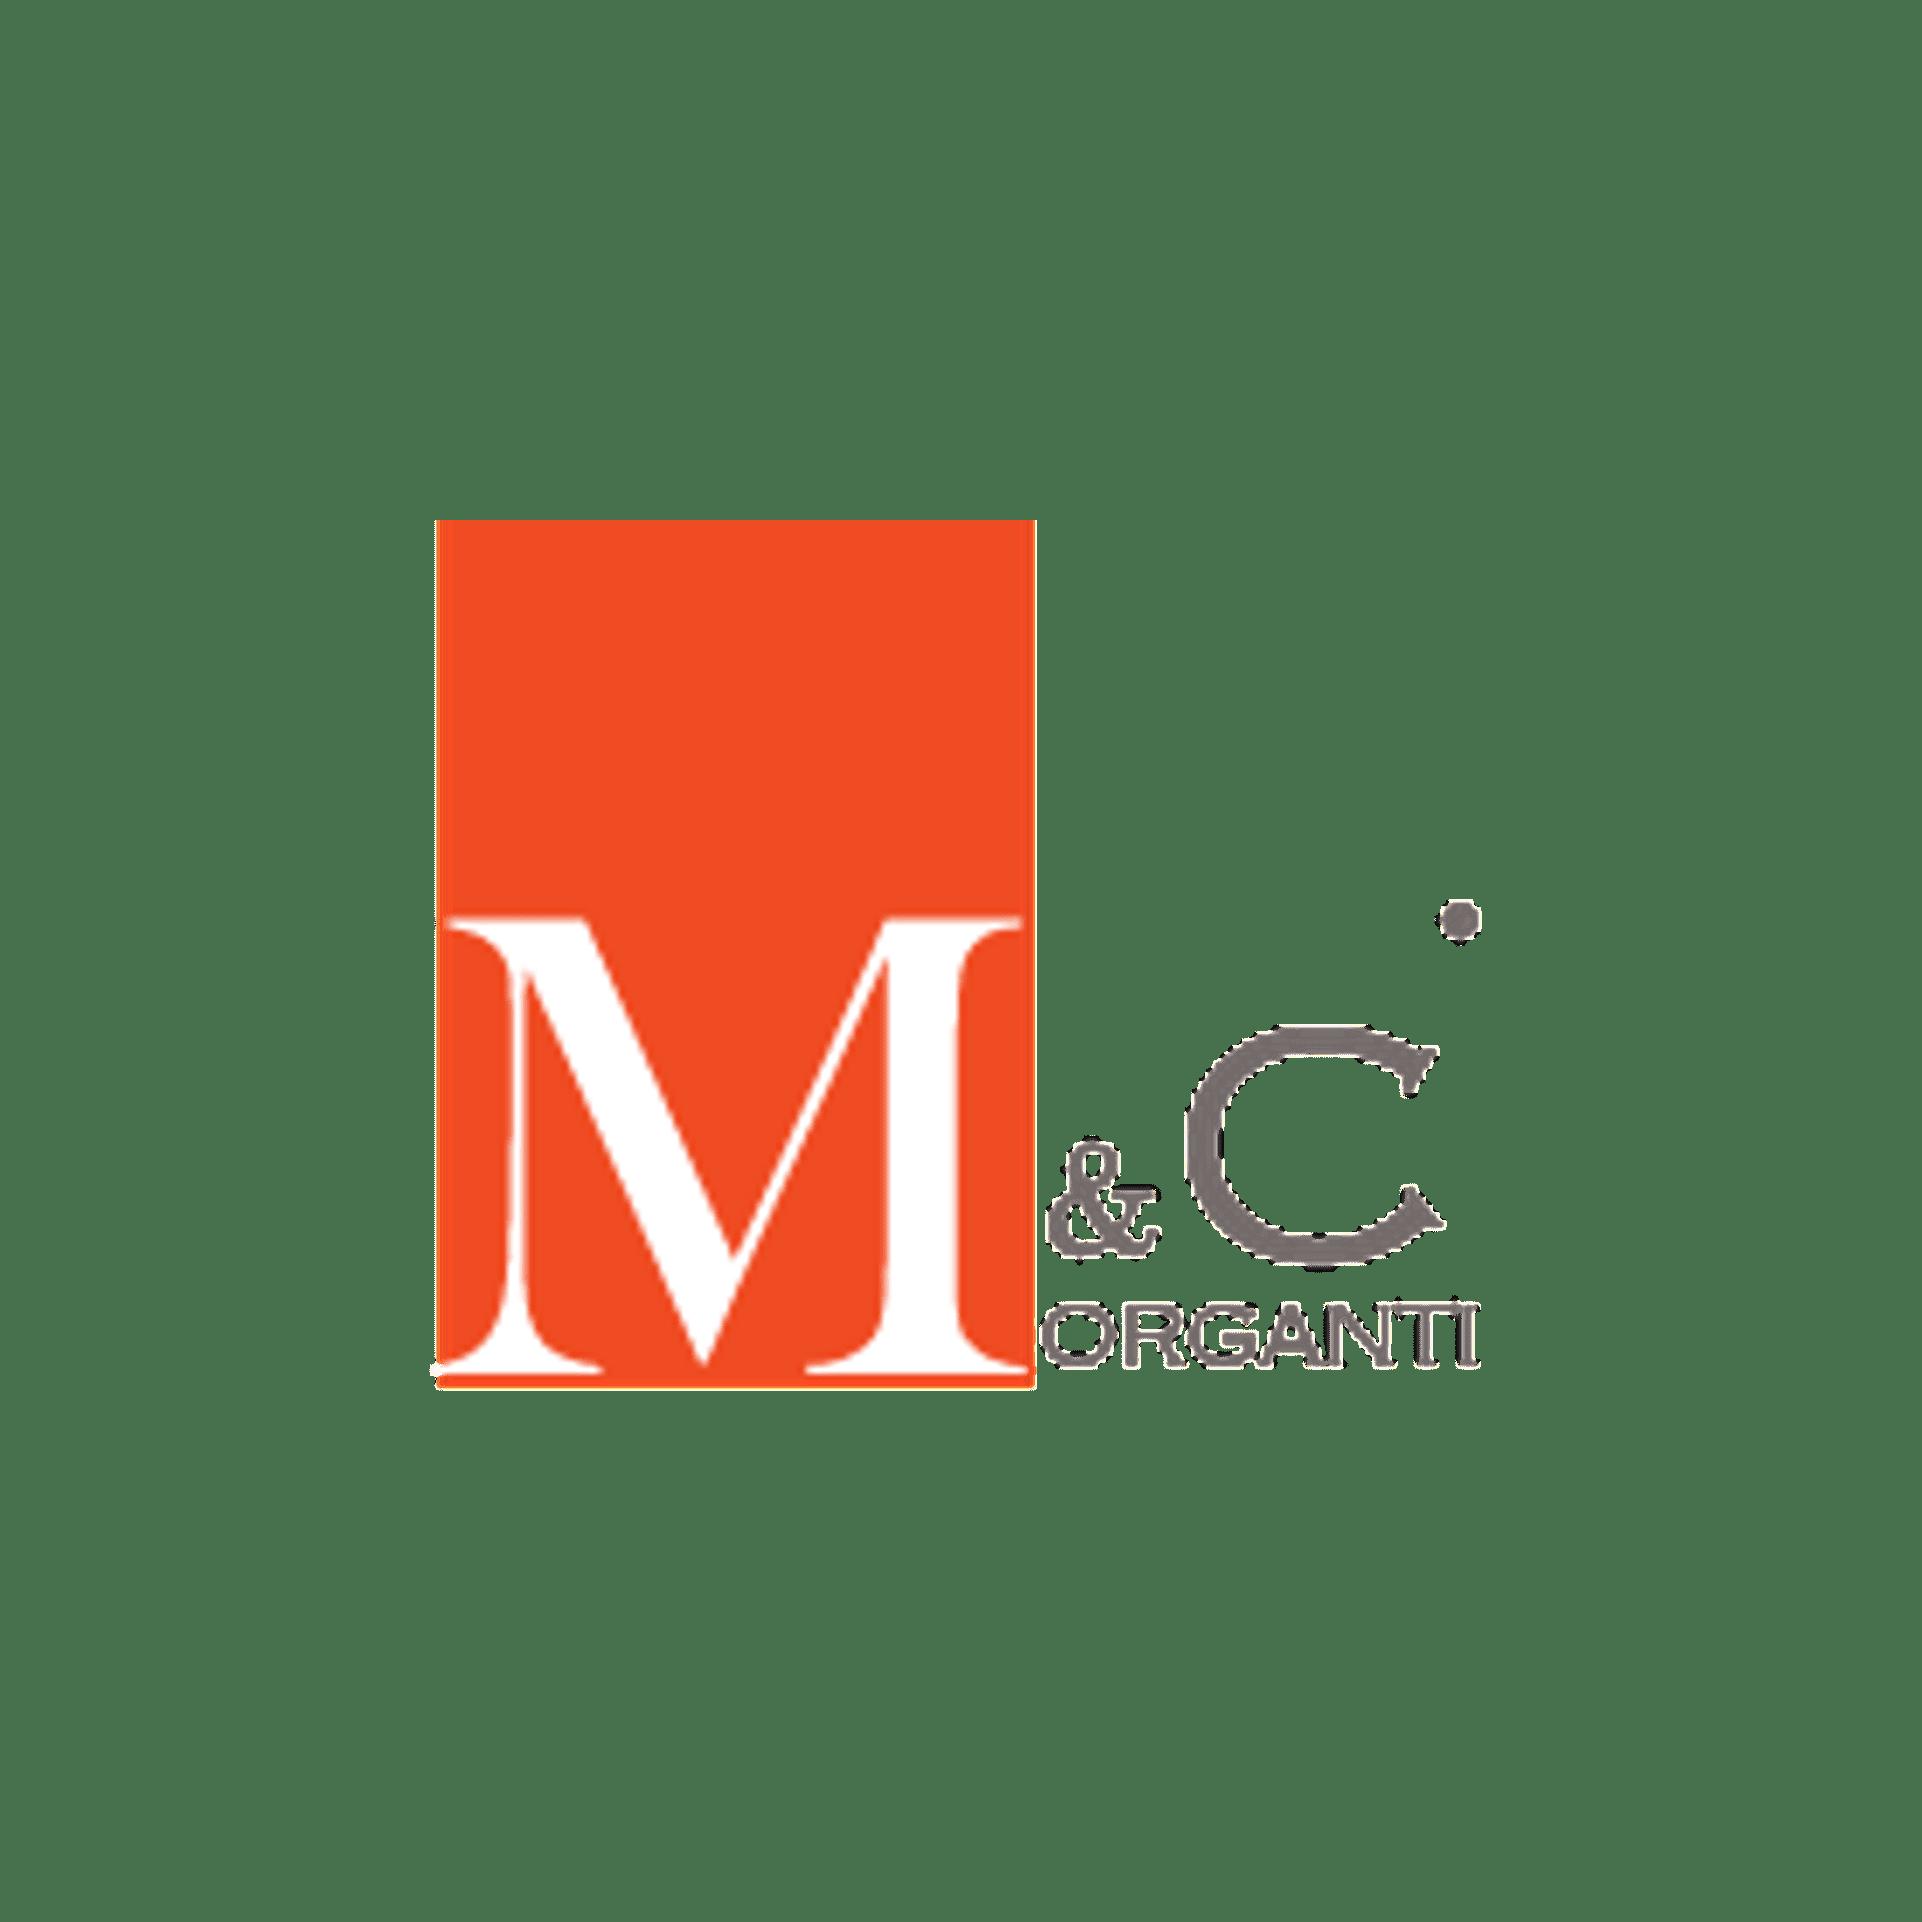 Sponsor tony arbolino, Morganti & co